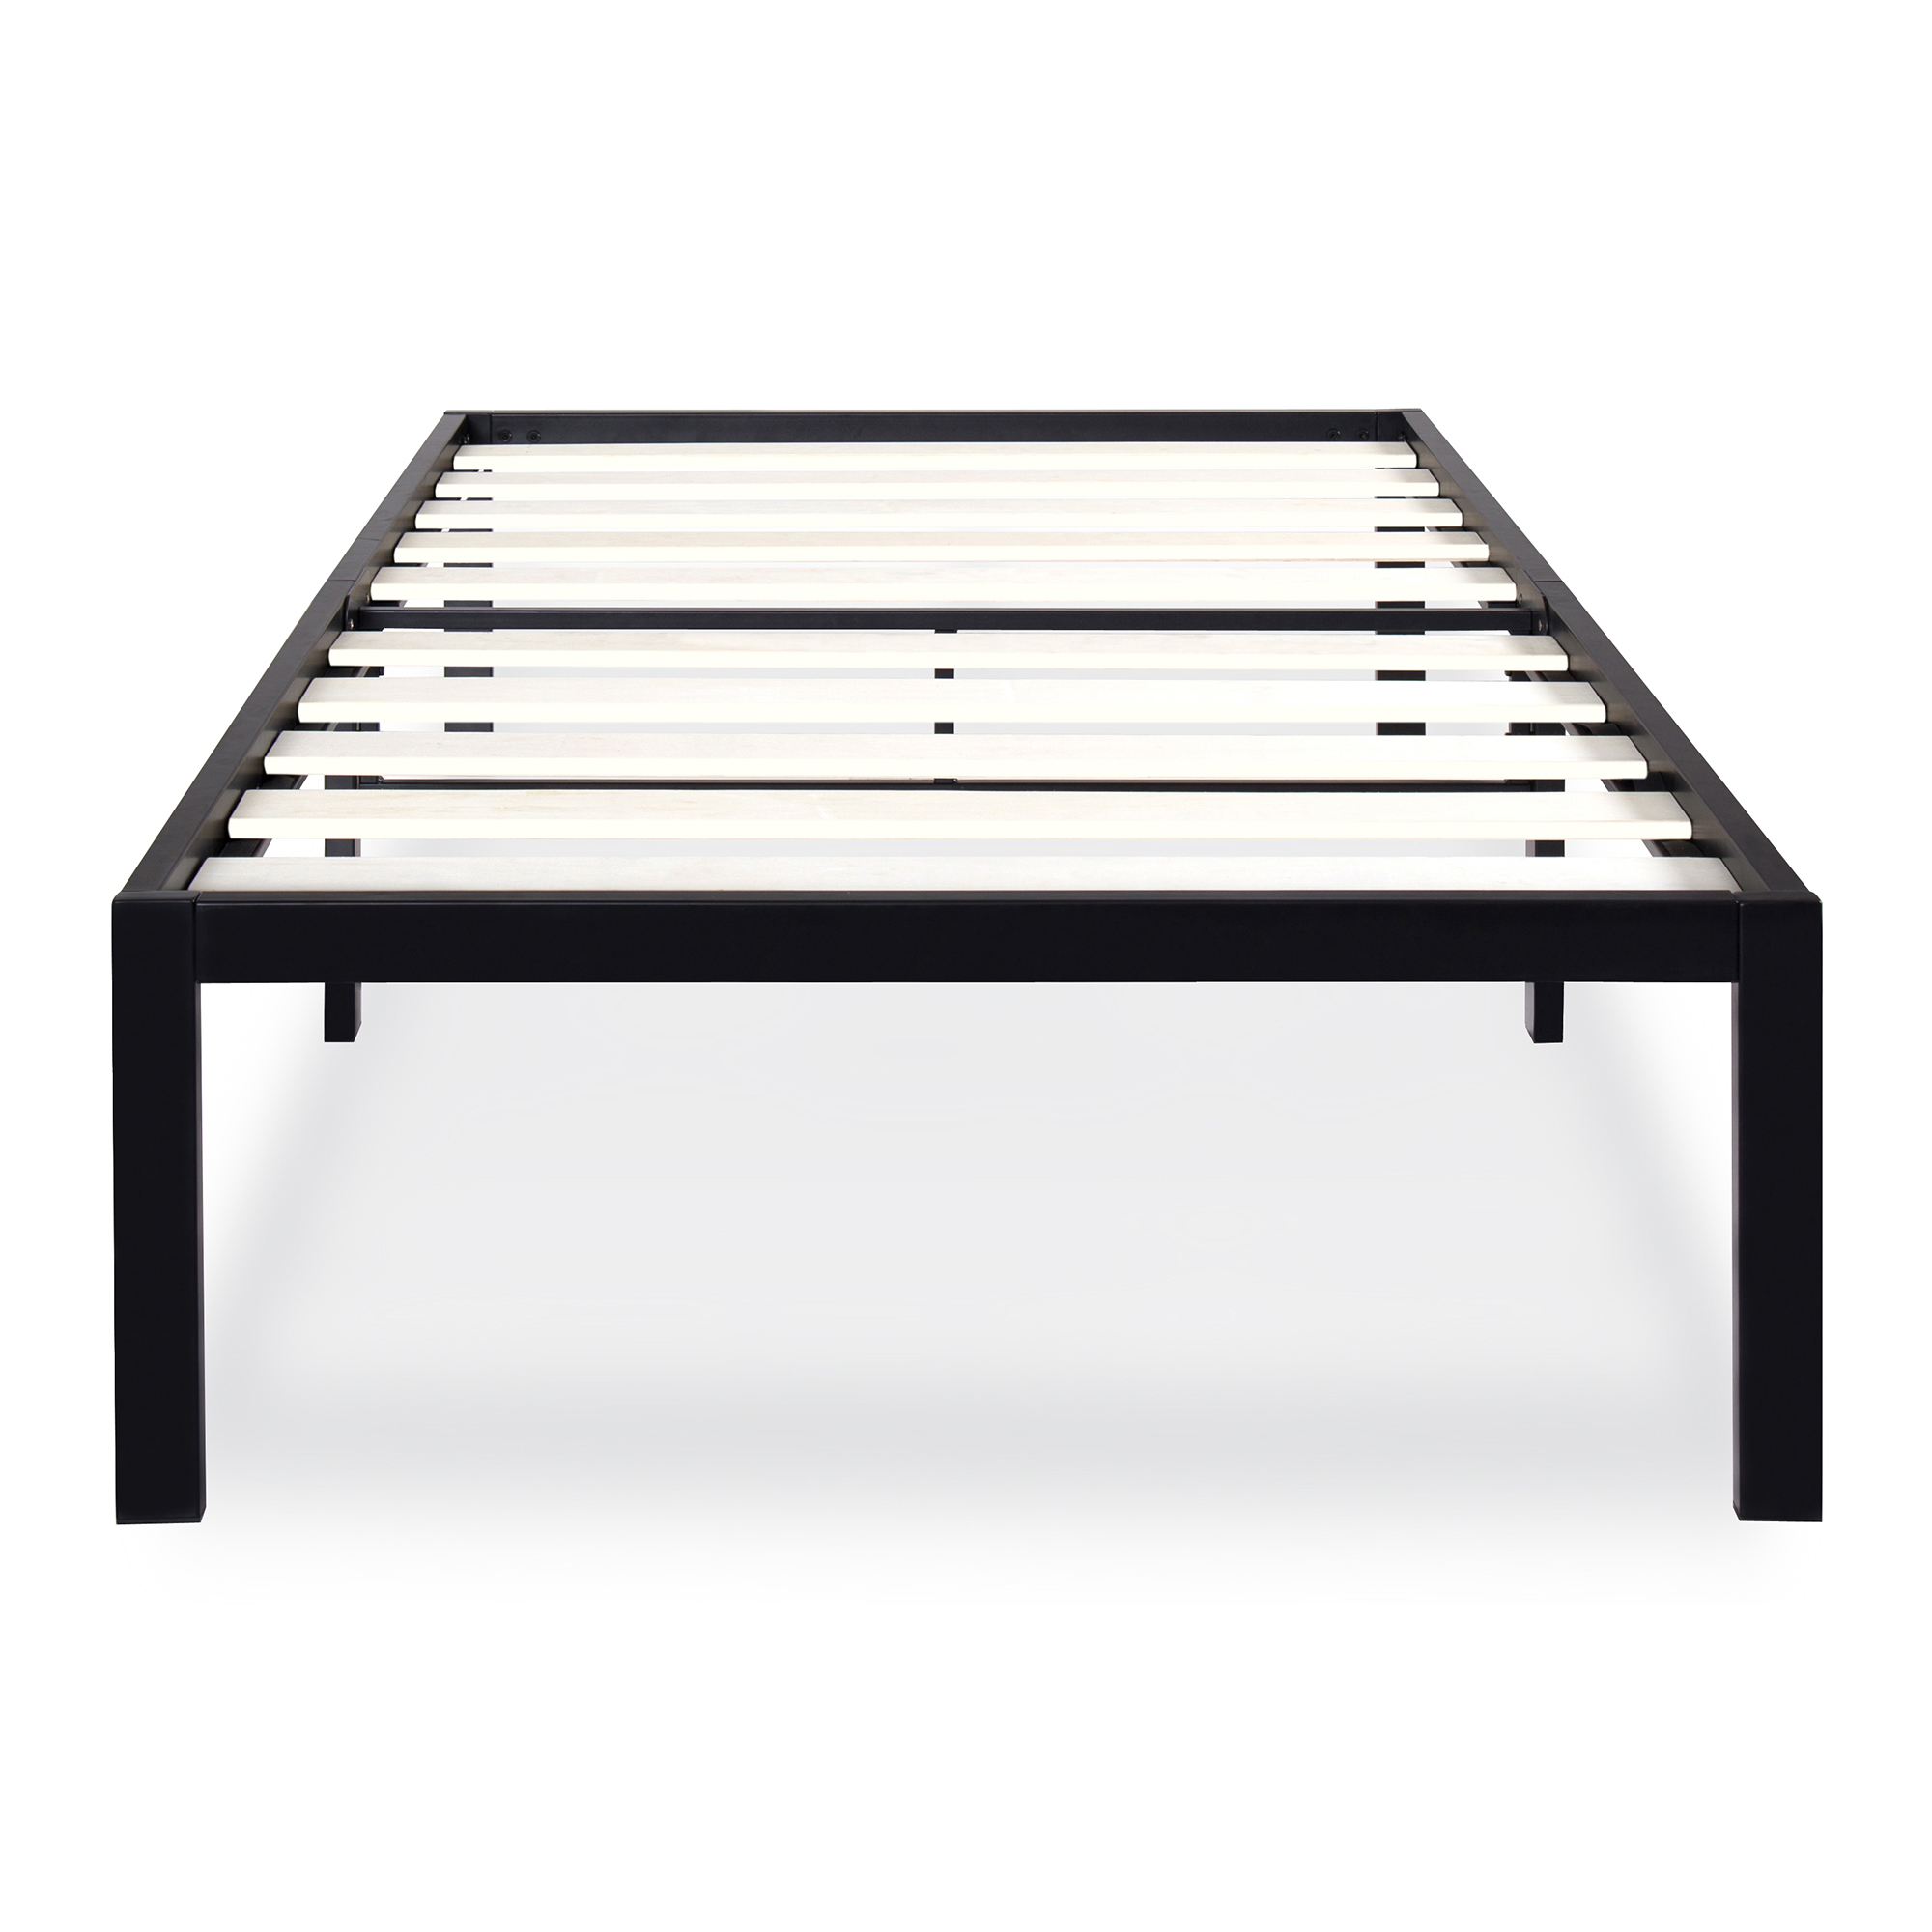 "GranRest 14"" Wood Slat Bed Frame- W7500 Twin"